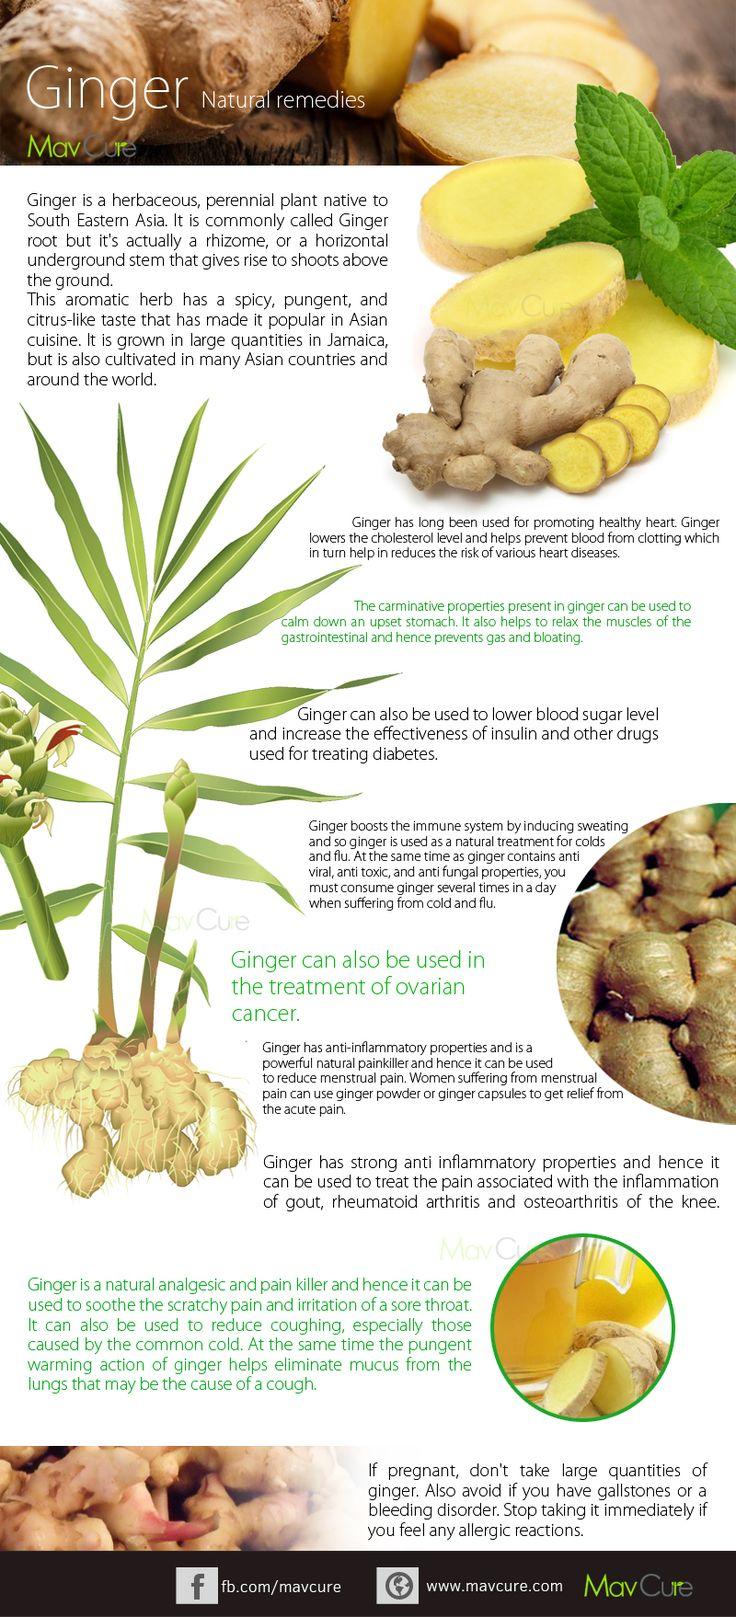 health benefits of ayurveda | ... Ginger Juice & Health Benefits Of Using It - MavCure | Raw Ayurveda